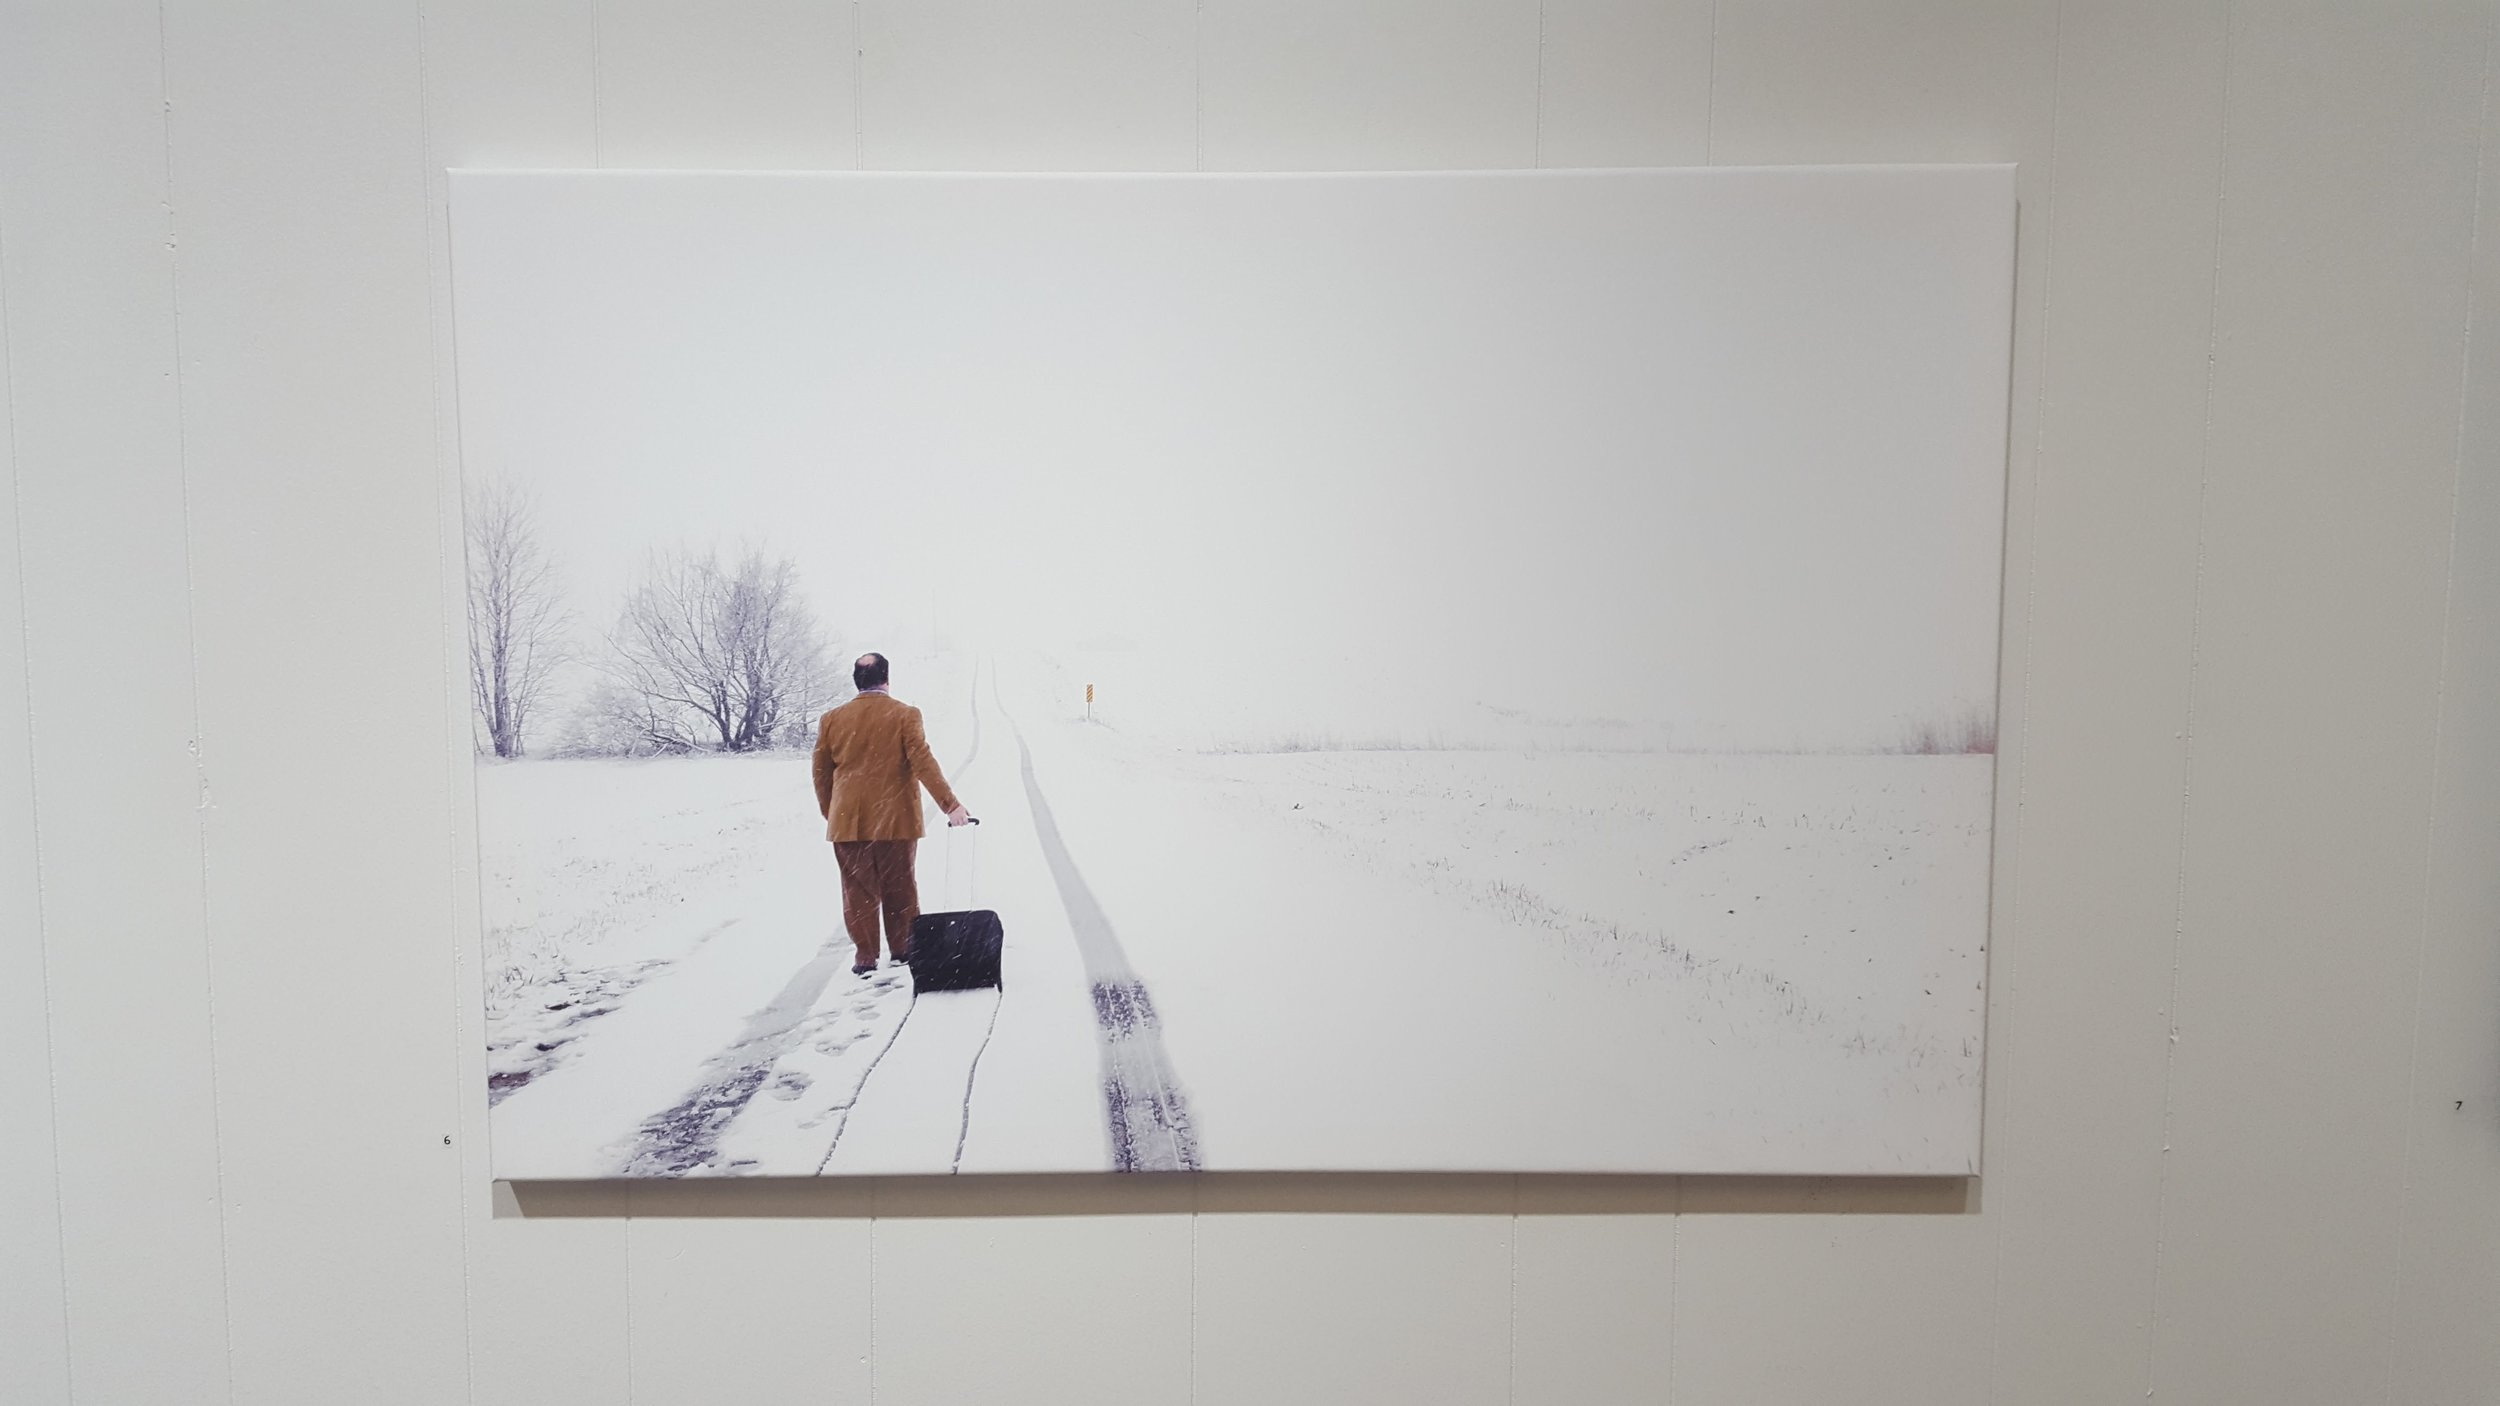 Installation view: No Snow Days , 2018. Image courtesy of Edward Breitweiser.